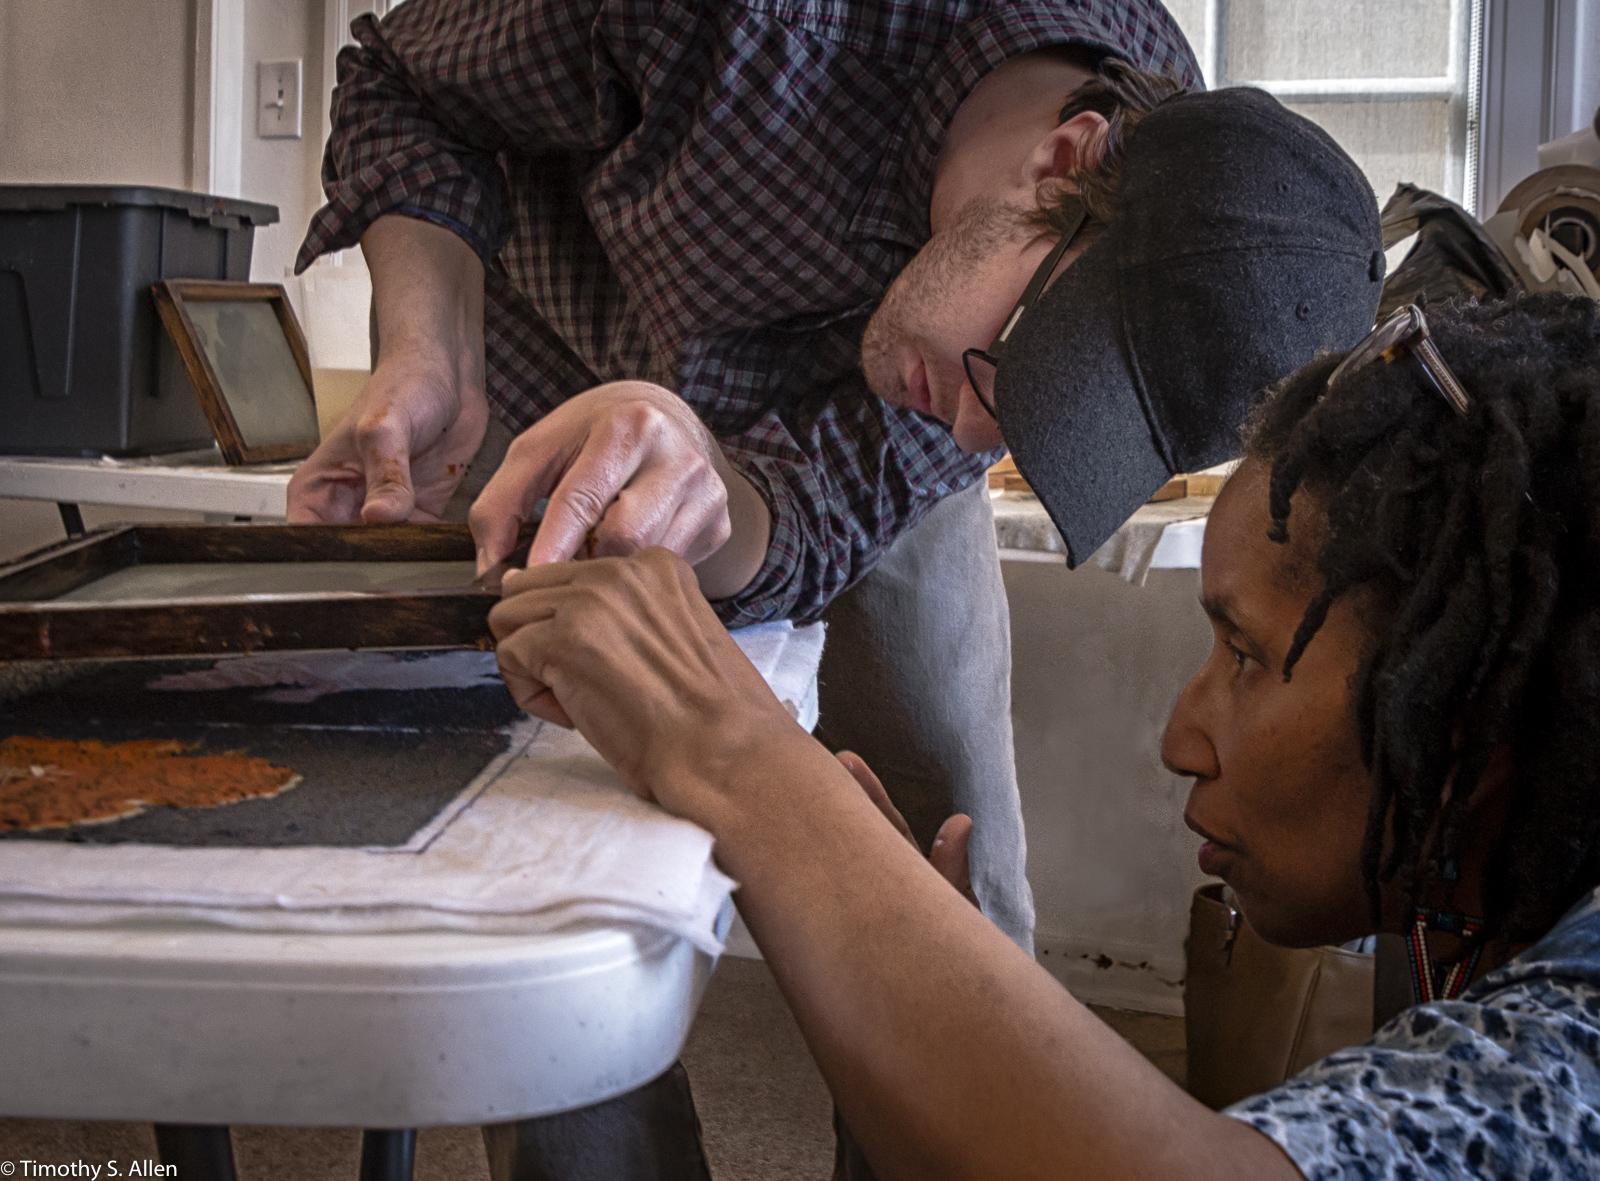 Second Saturday Workshop Jane Ingram Allen WEAD Artist in Residency Museum of Art and History - Cedar Center for the Arts, Lancaster, California, U.S.A. February 27, 2016 http://janeingramallen.wordpress.com